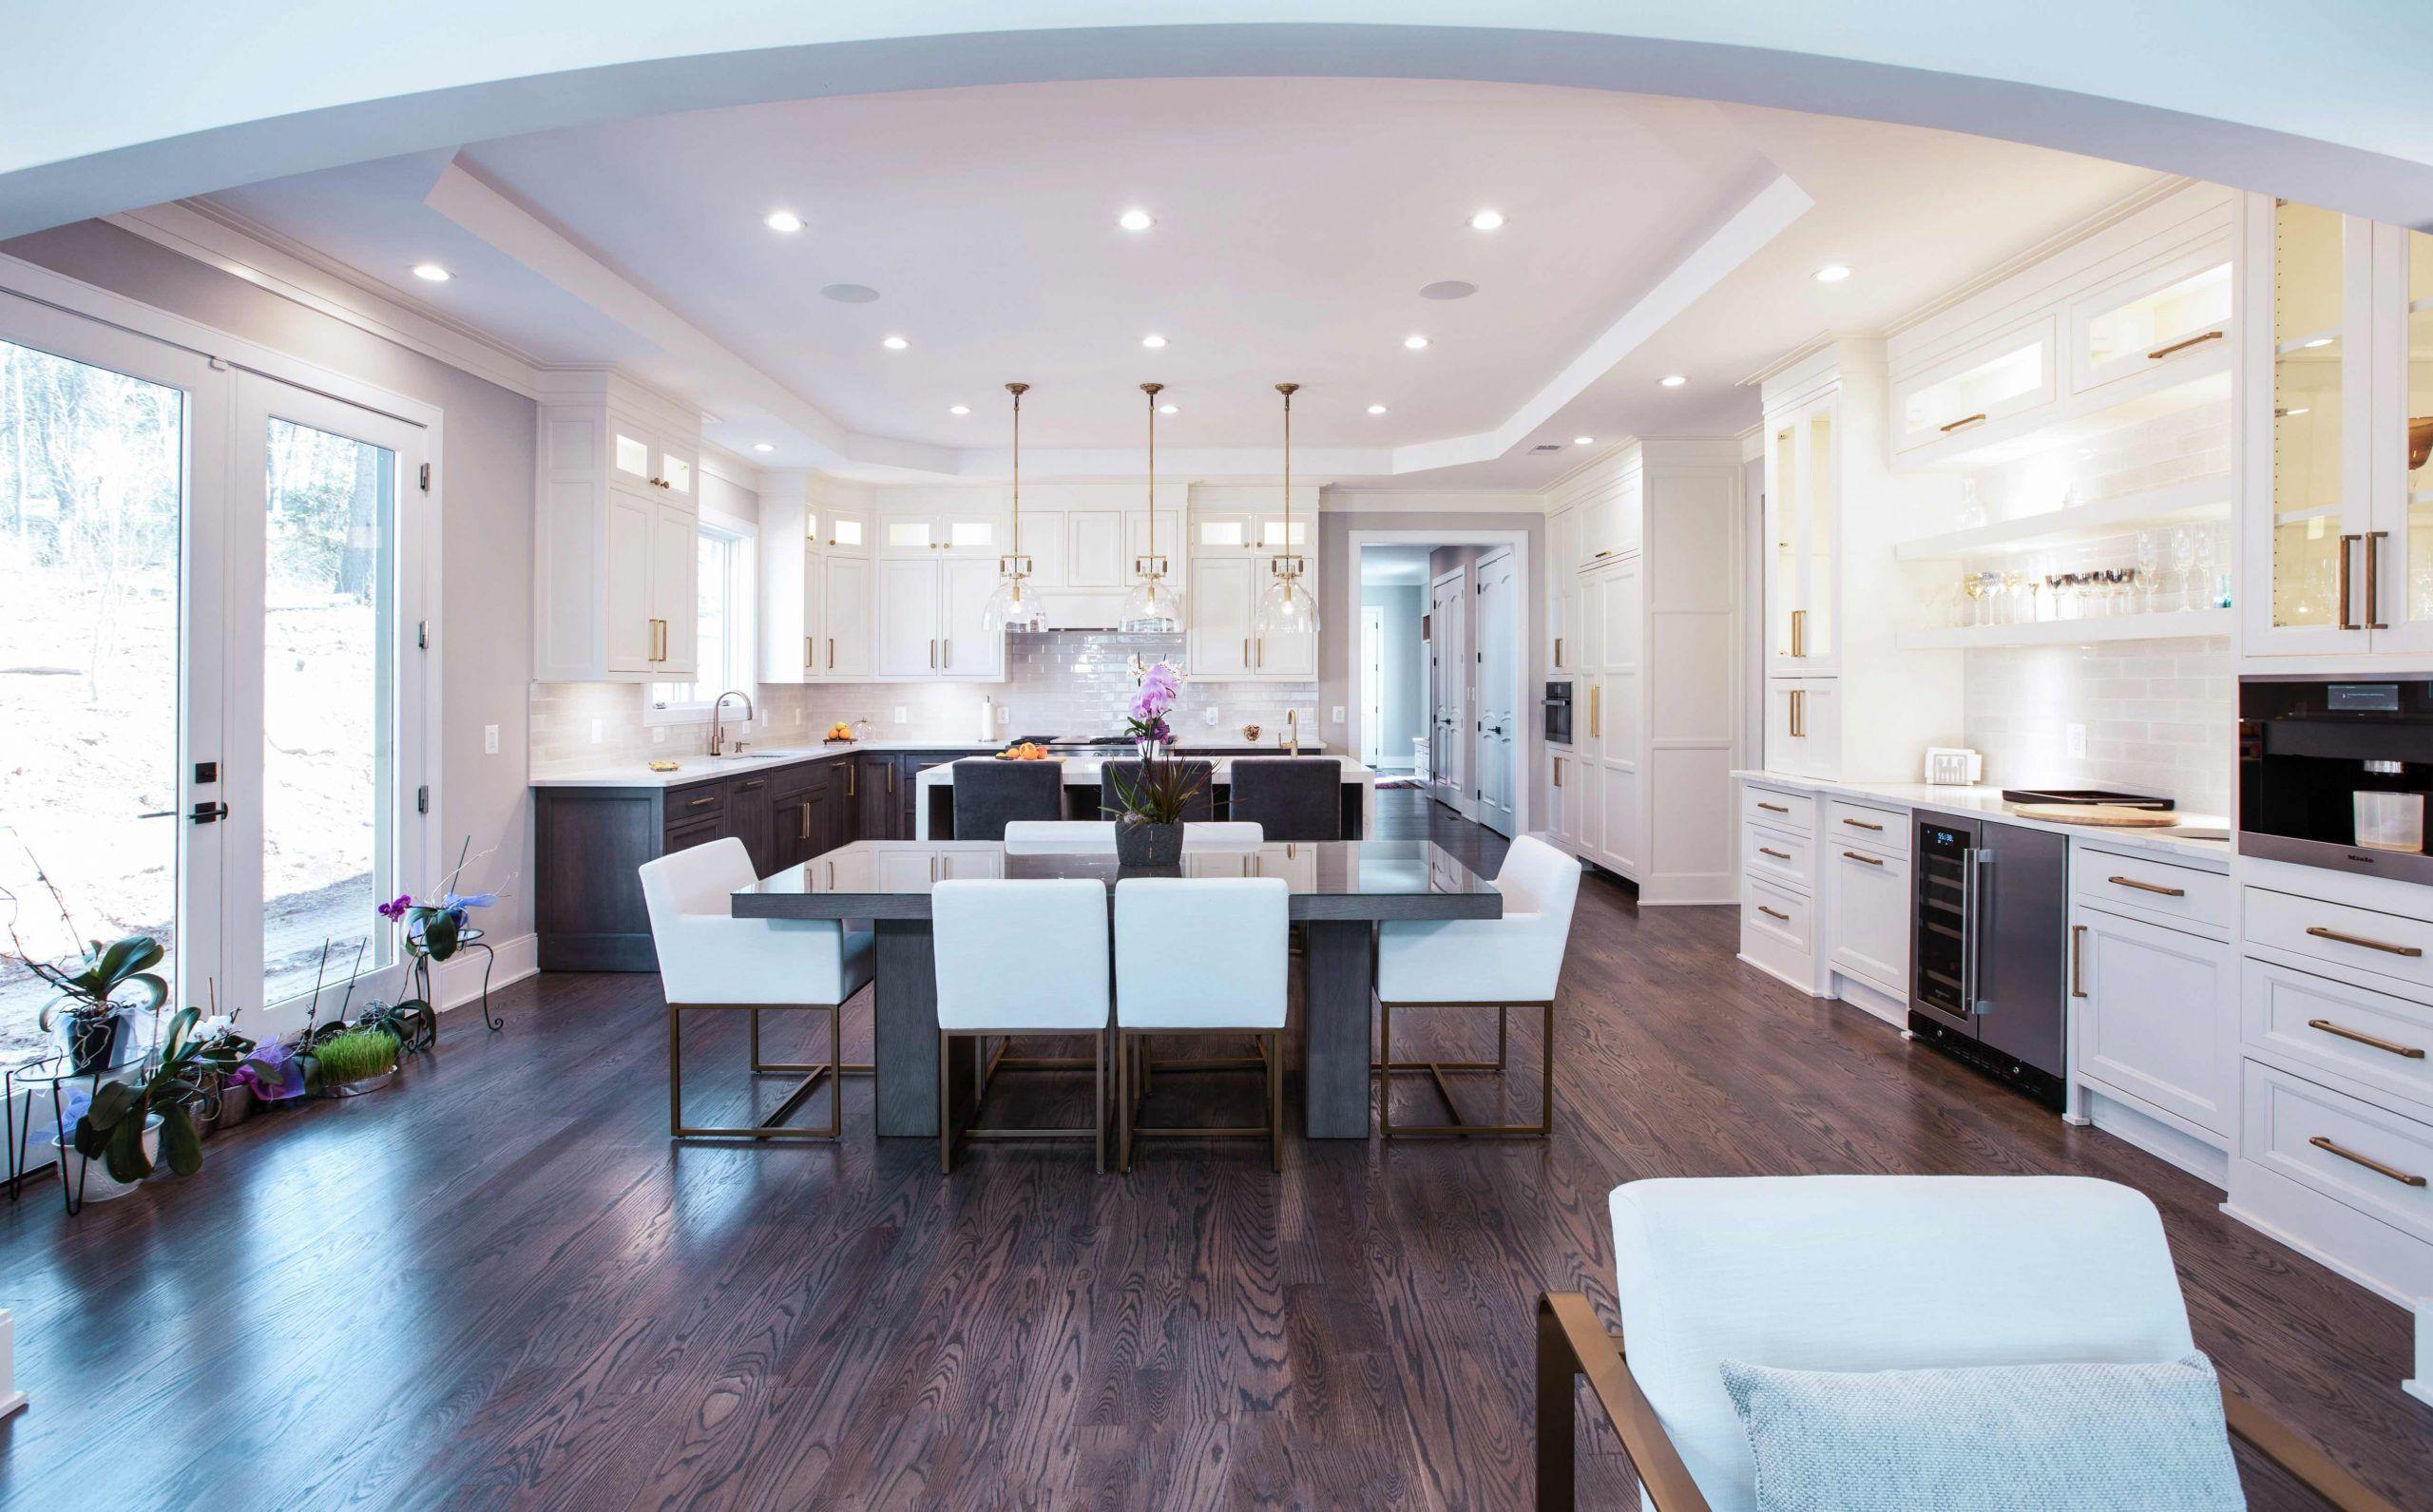 10 Decorating Kitchen Design Stores Near Me di 2020